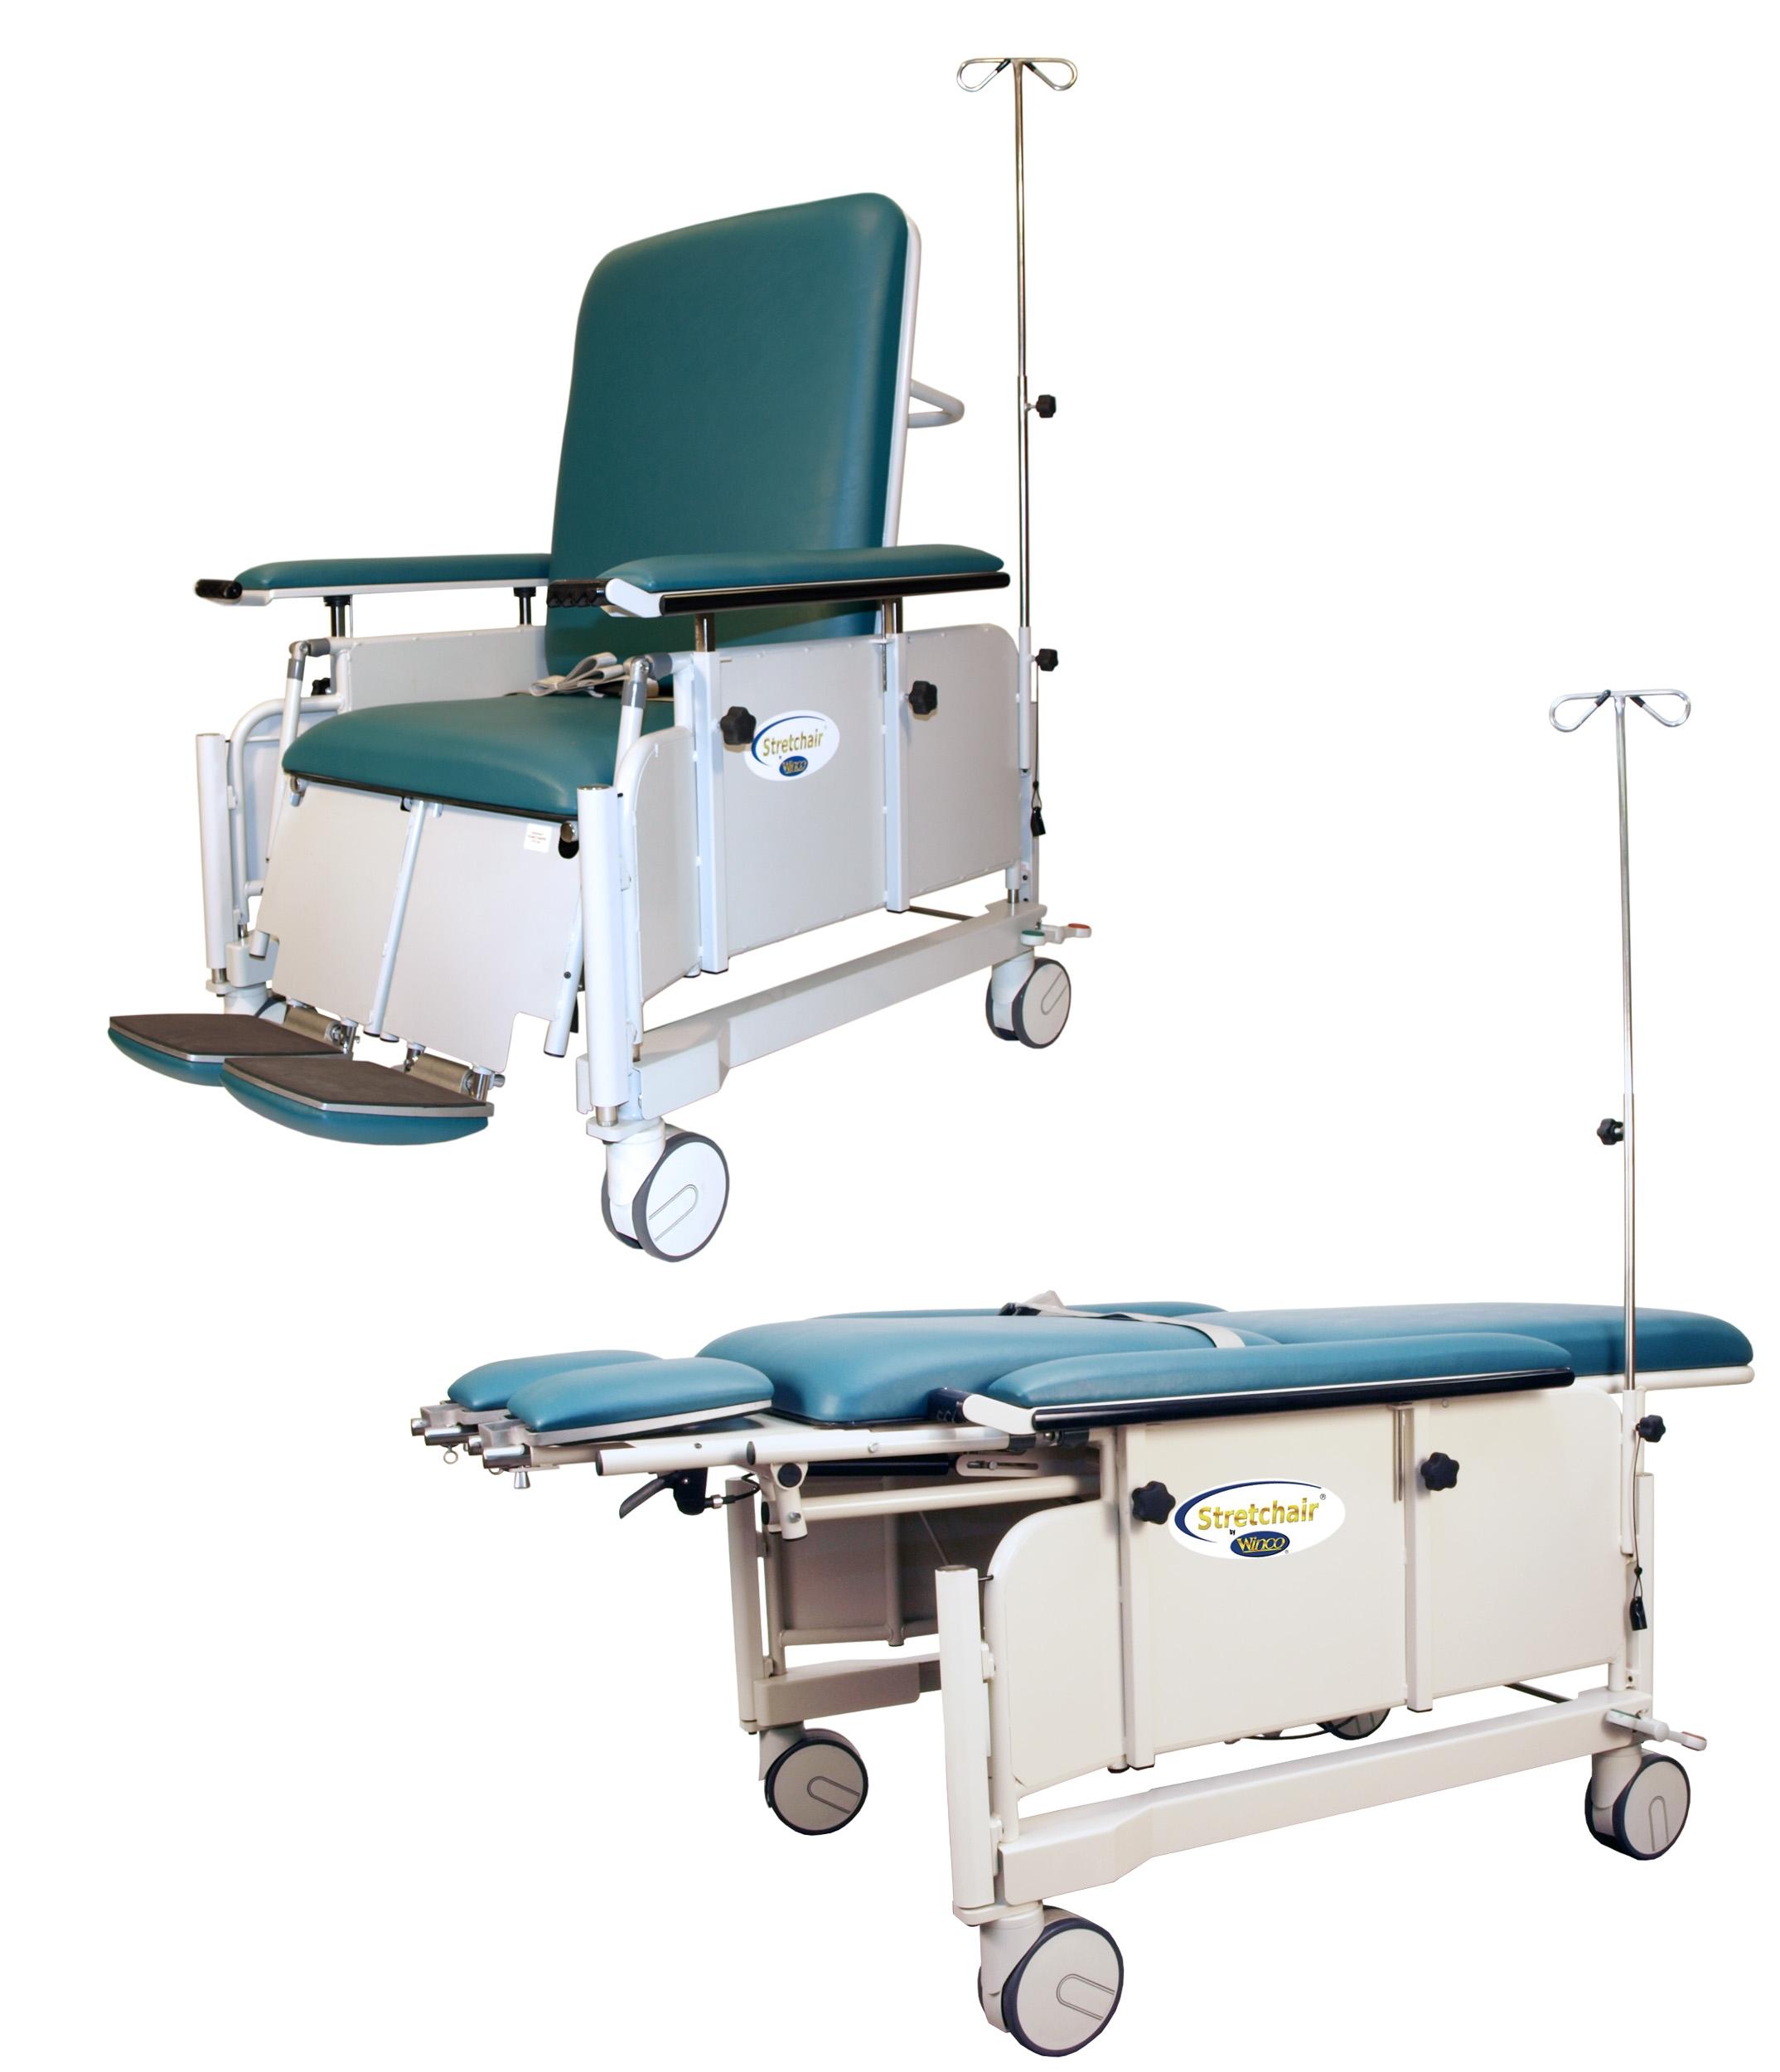 Winco S750 Stretchair